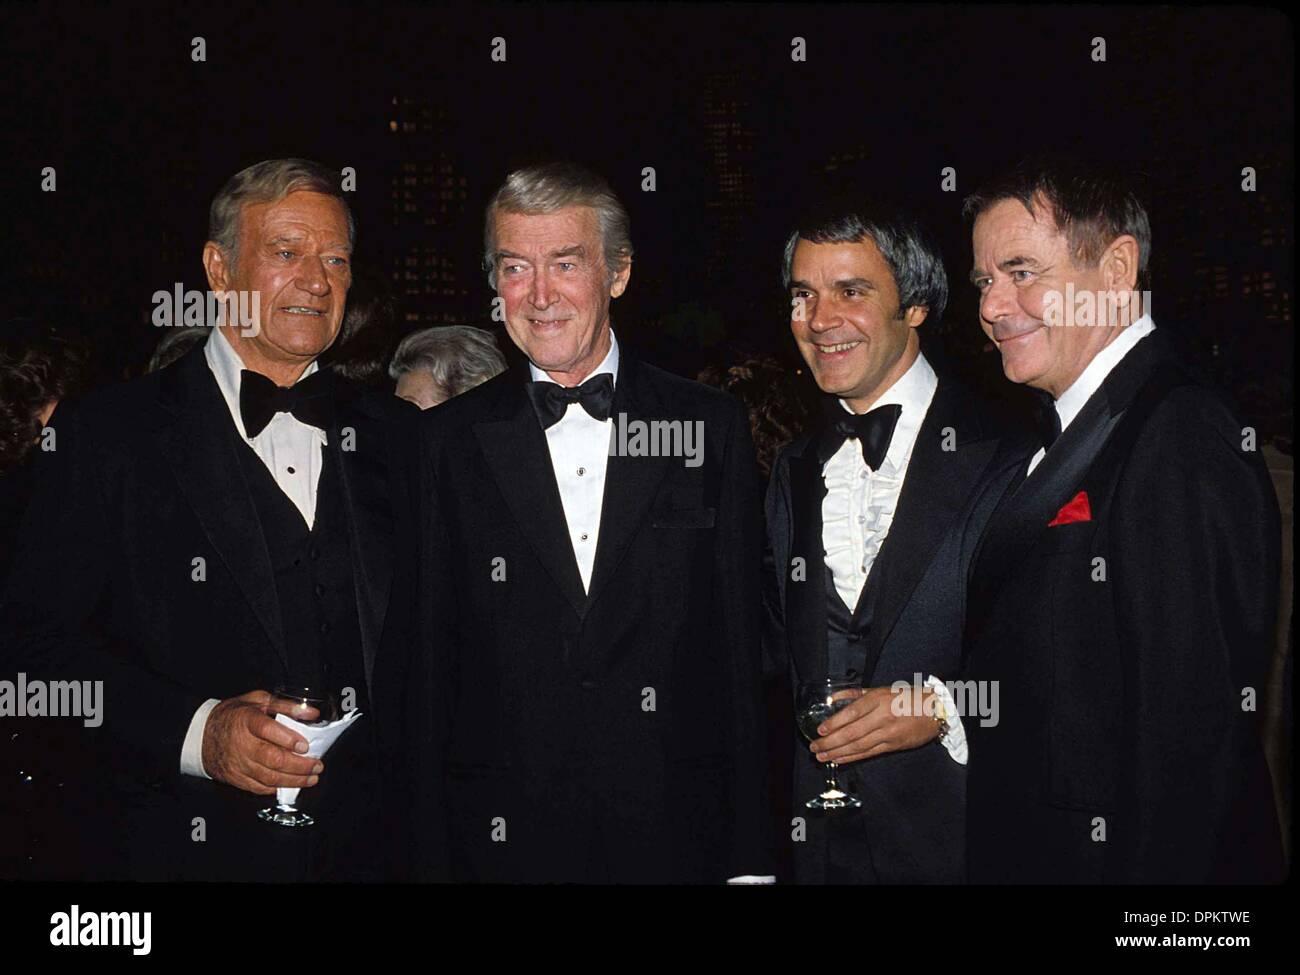 Aug. 31, 2006 - GLENN FORD WITH JOHN WAYNE , JIMMY STEWART AND RICH LITTLE 1978.G8494S. BOB NOBLE-(Credit Image: Stock Photo